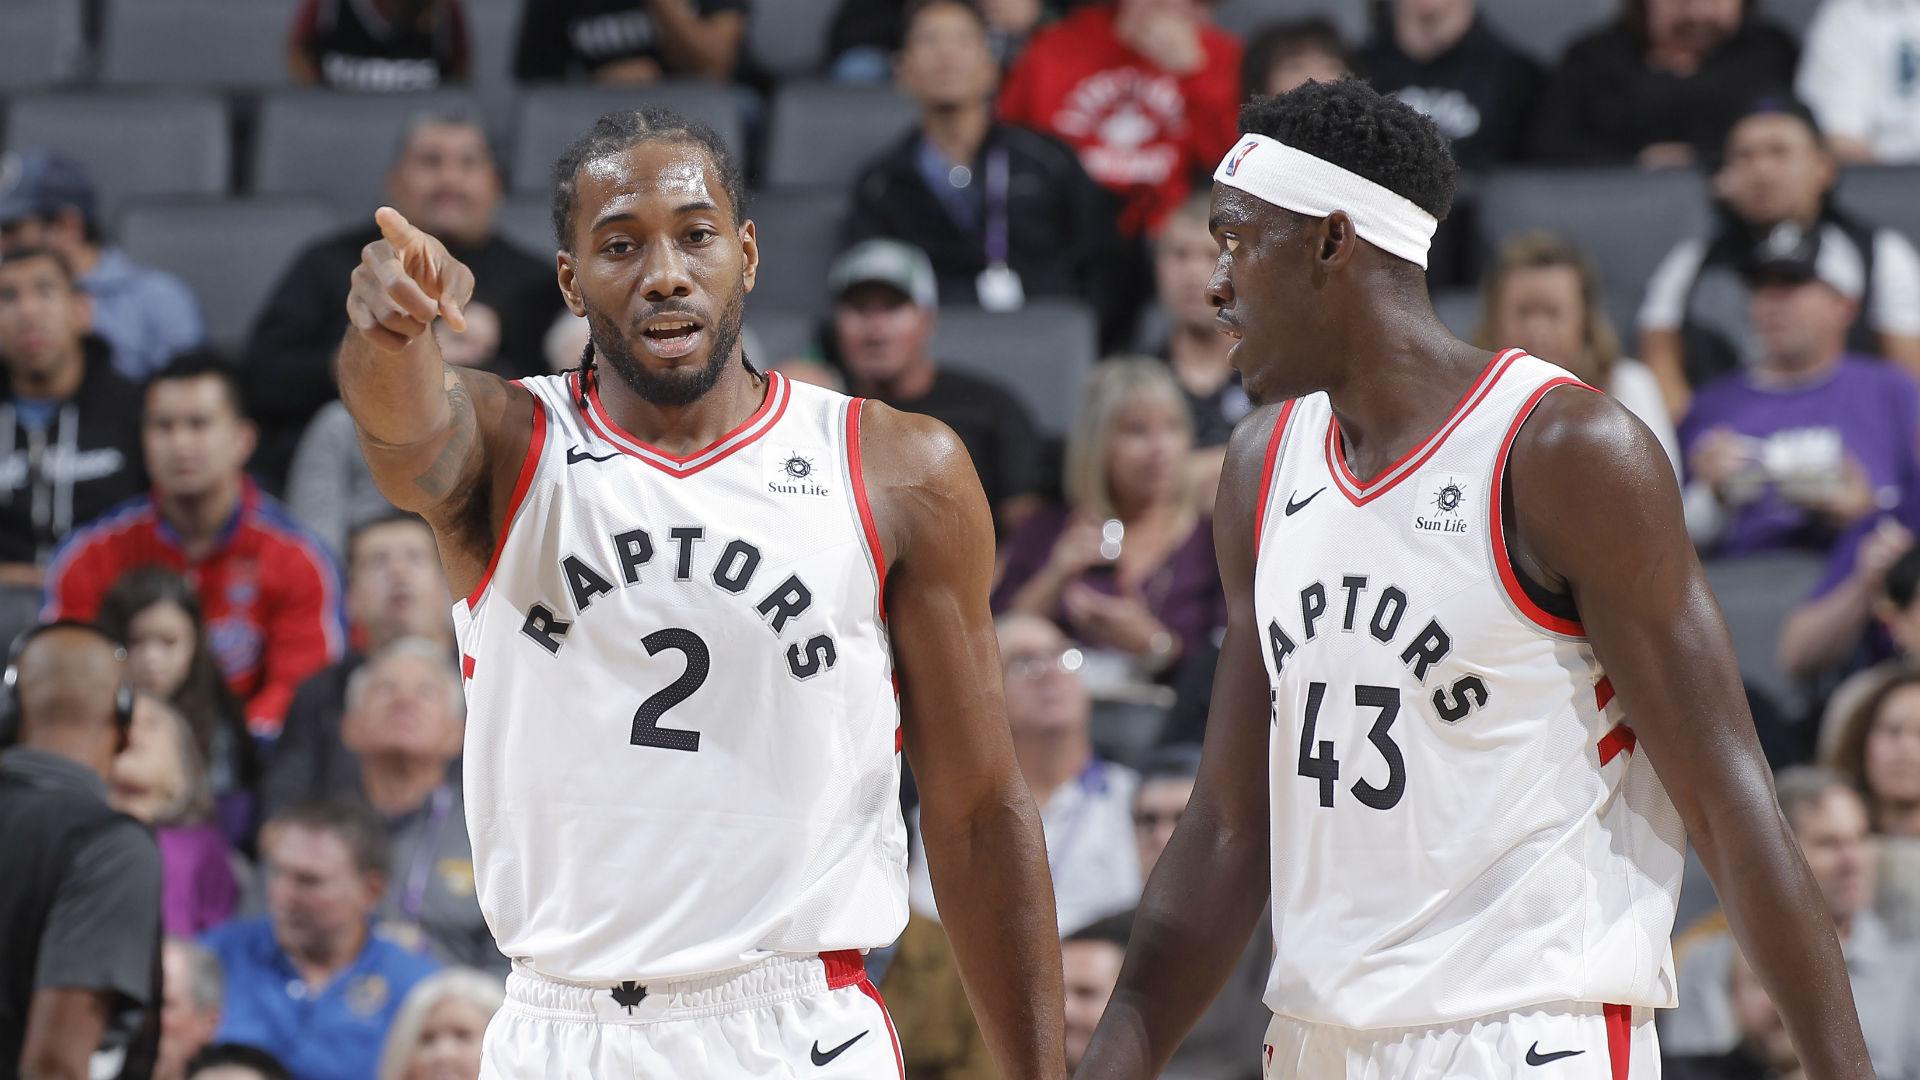 In games that Kawhi Leonard has missed, Pascal Siakam has been the Raptors' leading scorer.